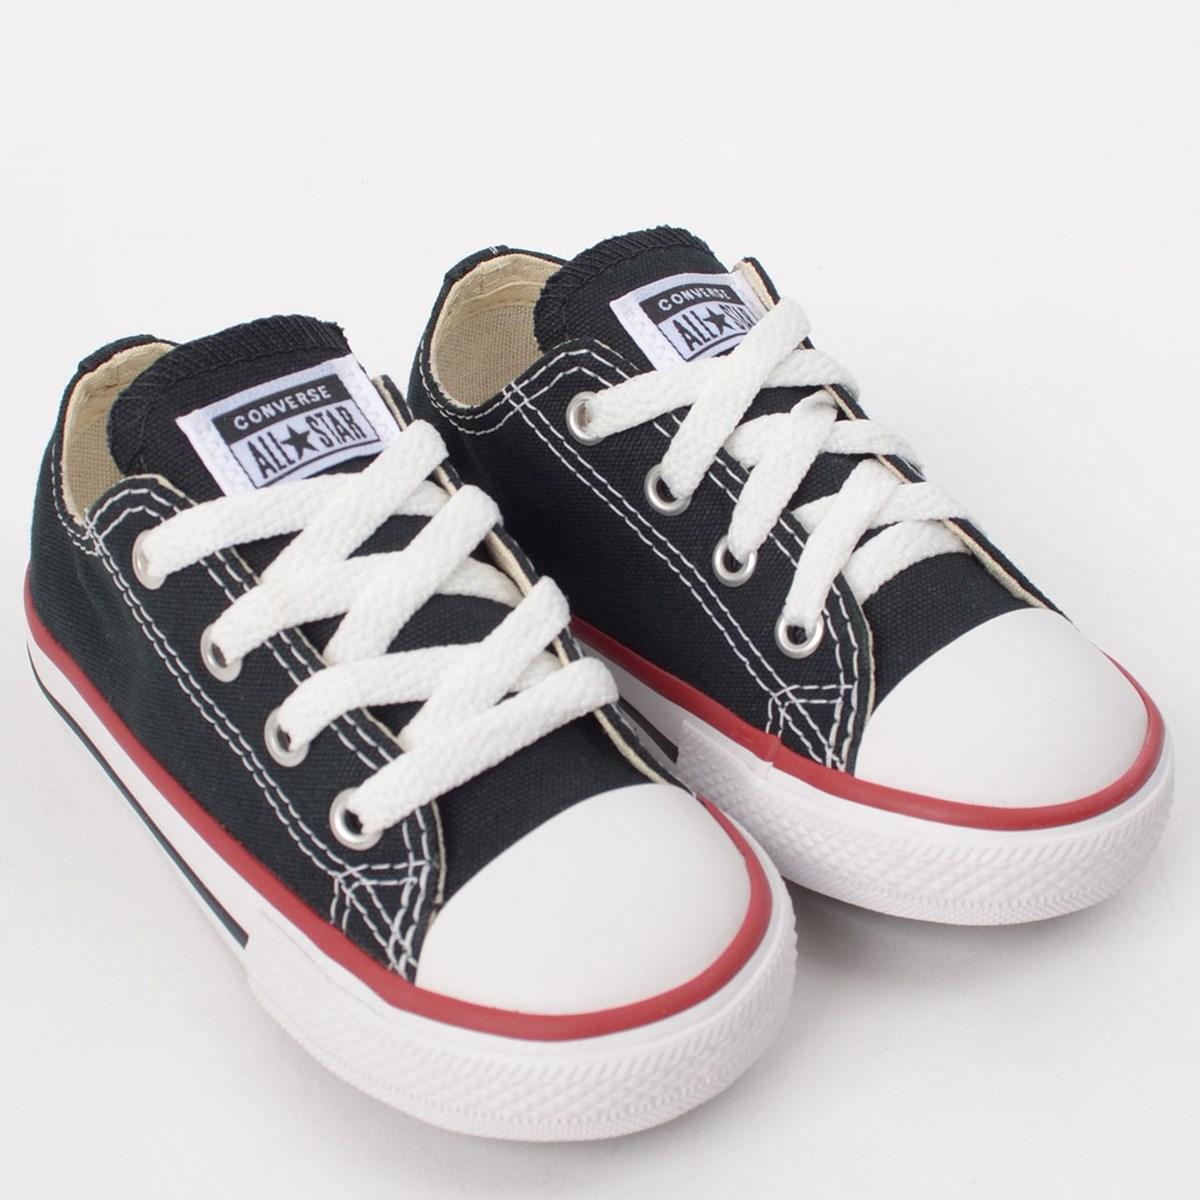 Tênis Converse All Star Kids CT As Core Ox Preto Vermelho CK00010007